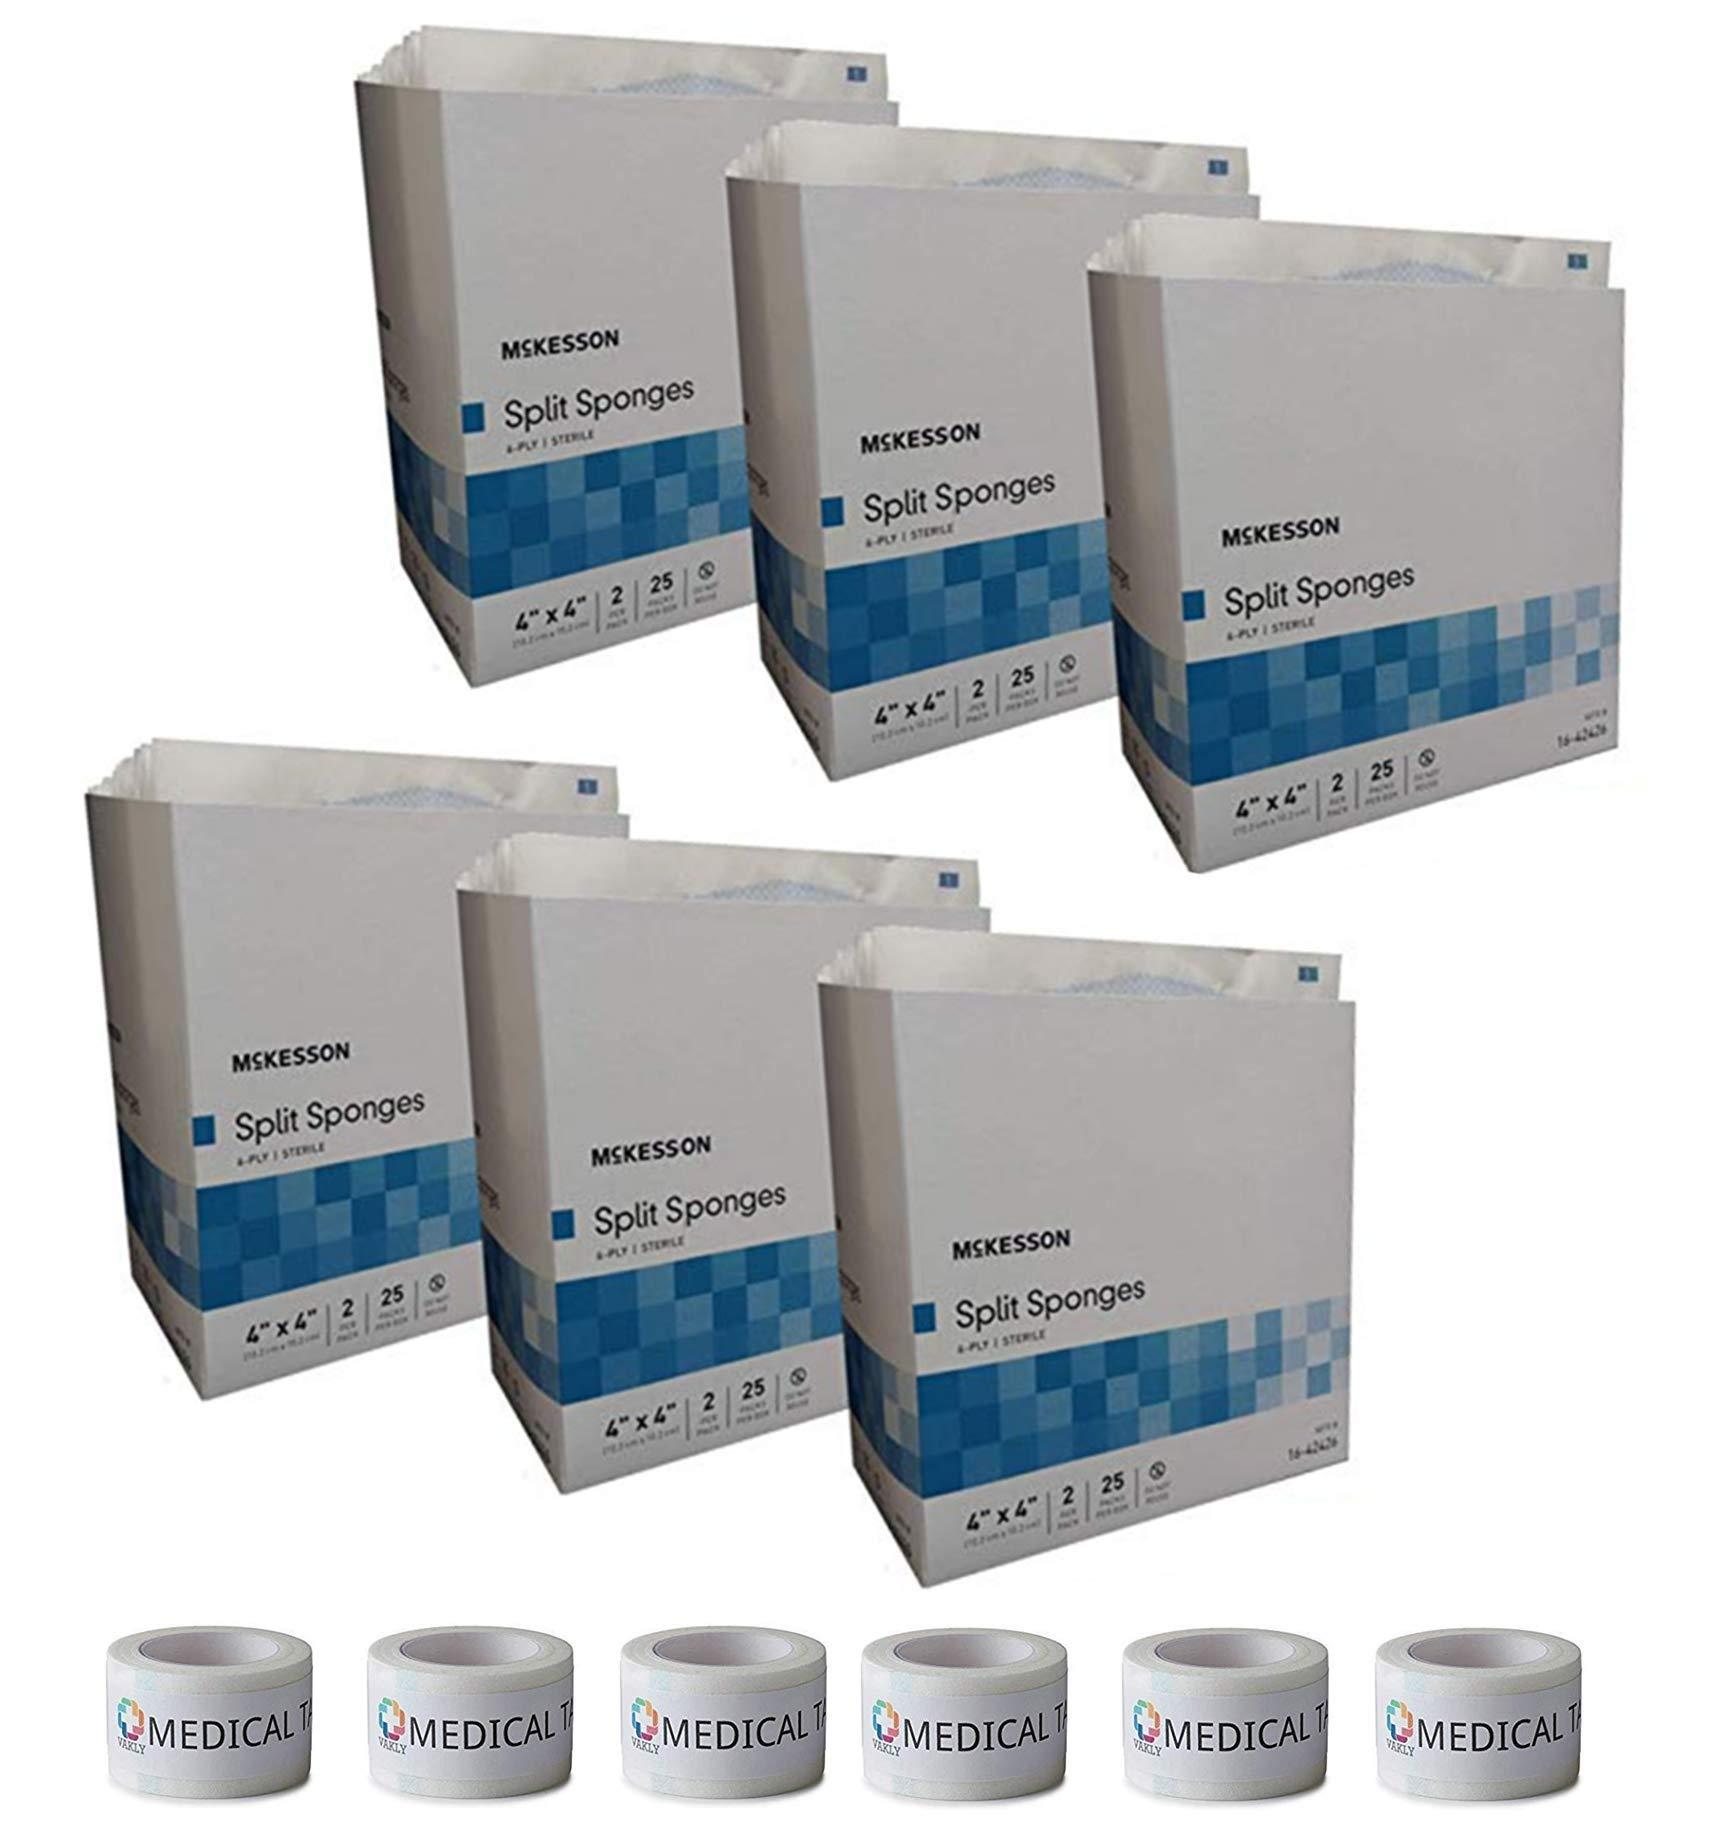 Sterile 4''X4'' 6 Ply Split Drain Sponge 6 Packs of 25 Packs of 2 + 6 Rolls of Vakly Medical Tape (6) by Vakly